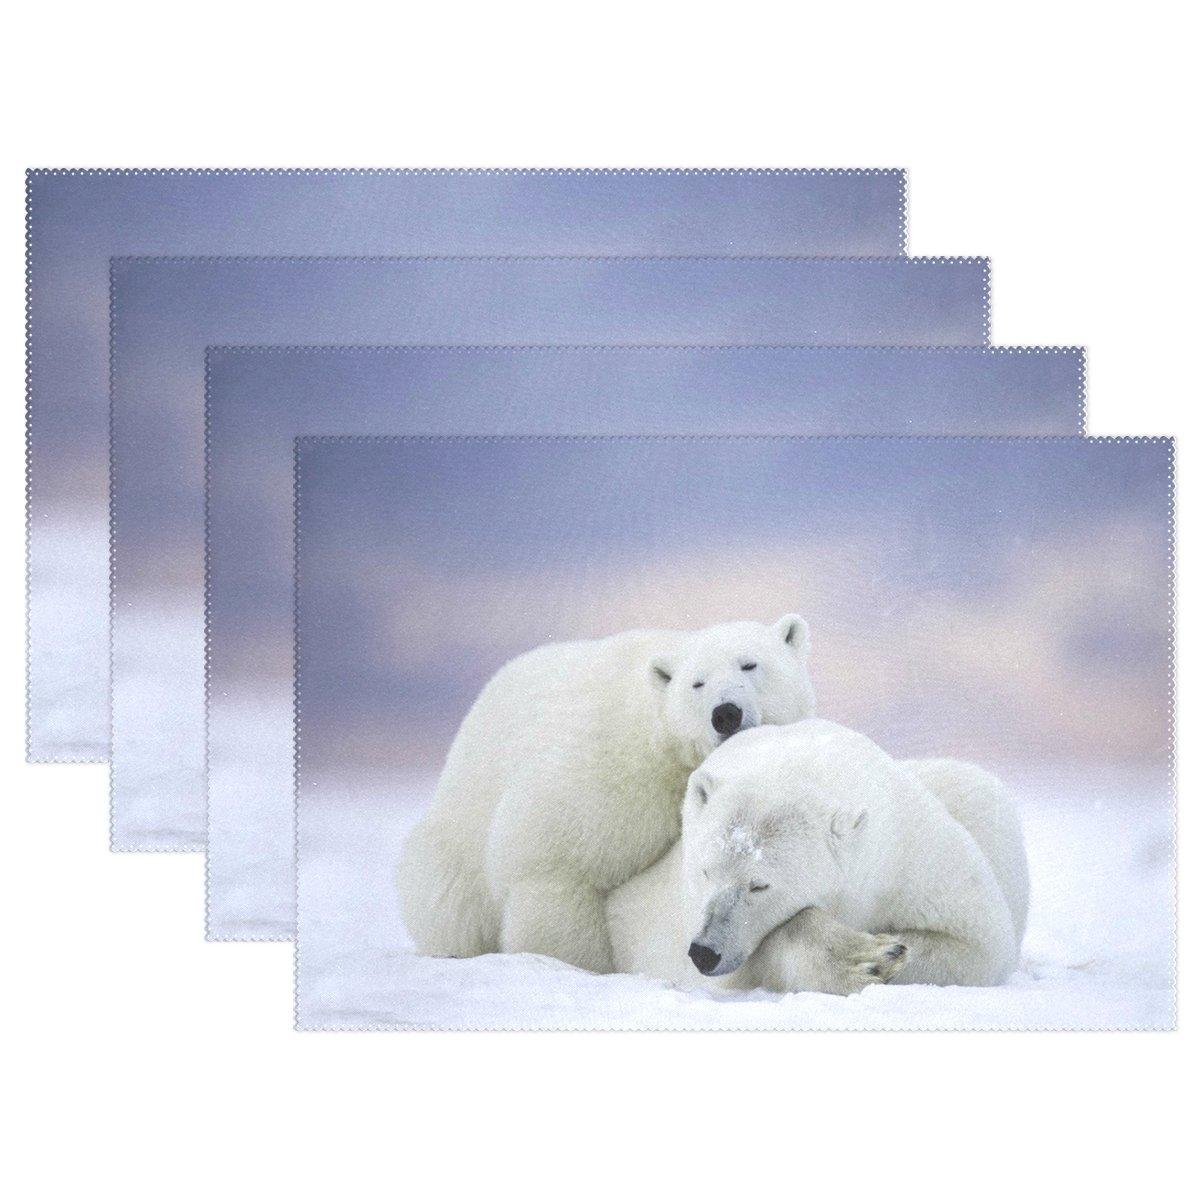 Wozo雪Cute Polar Bear Sleepingプレースマットテーブルマット12